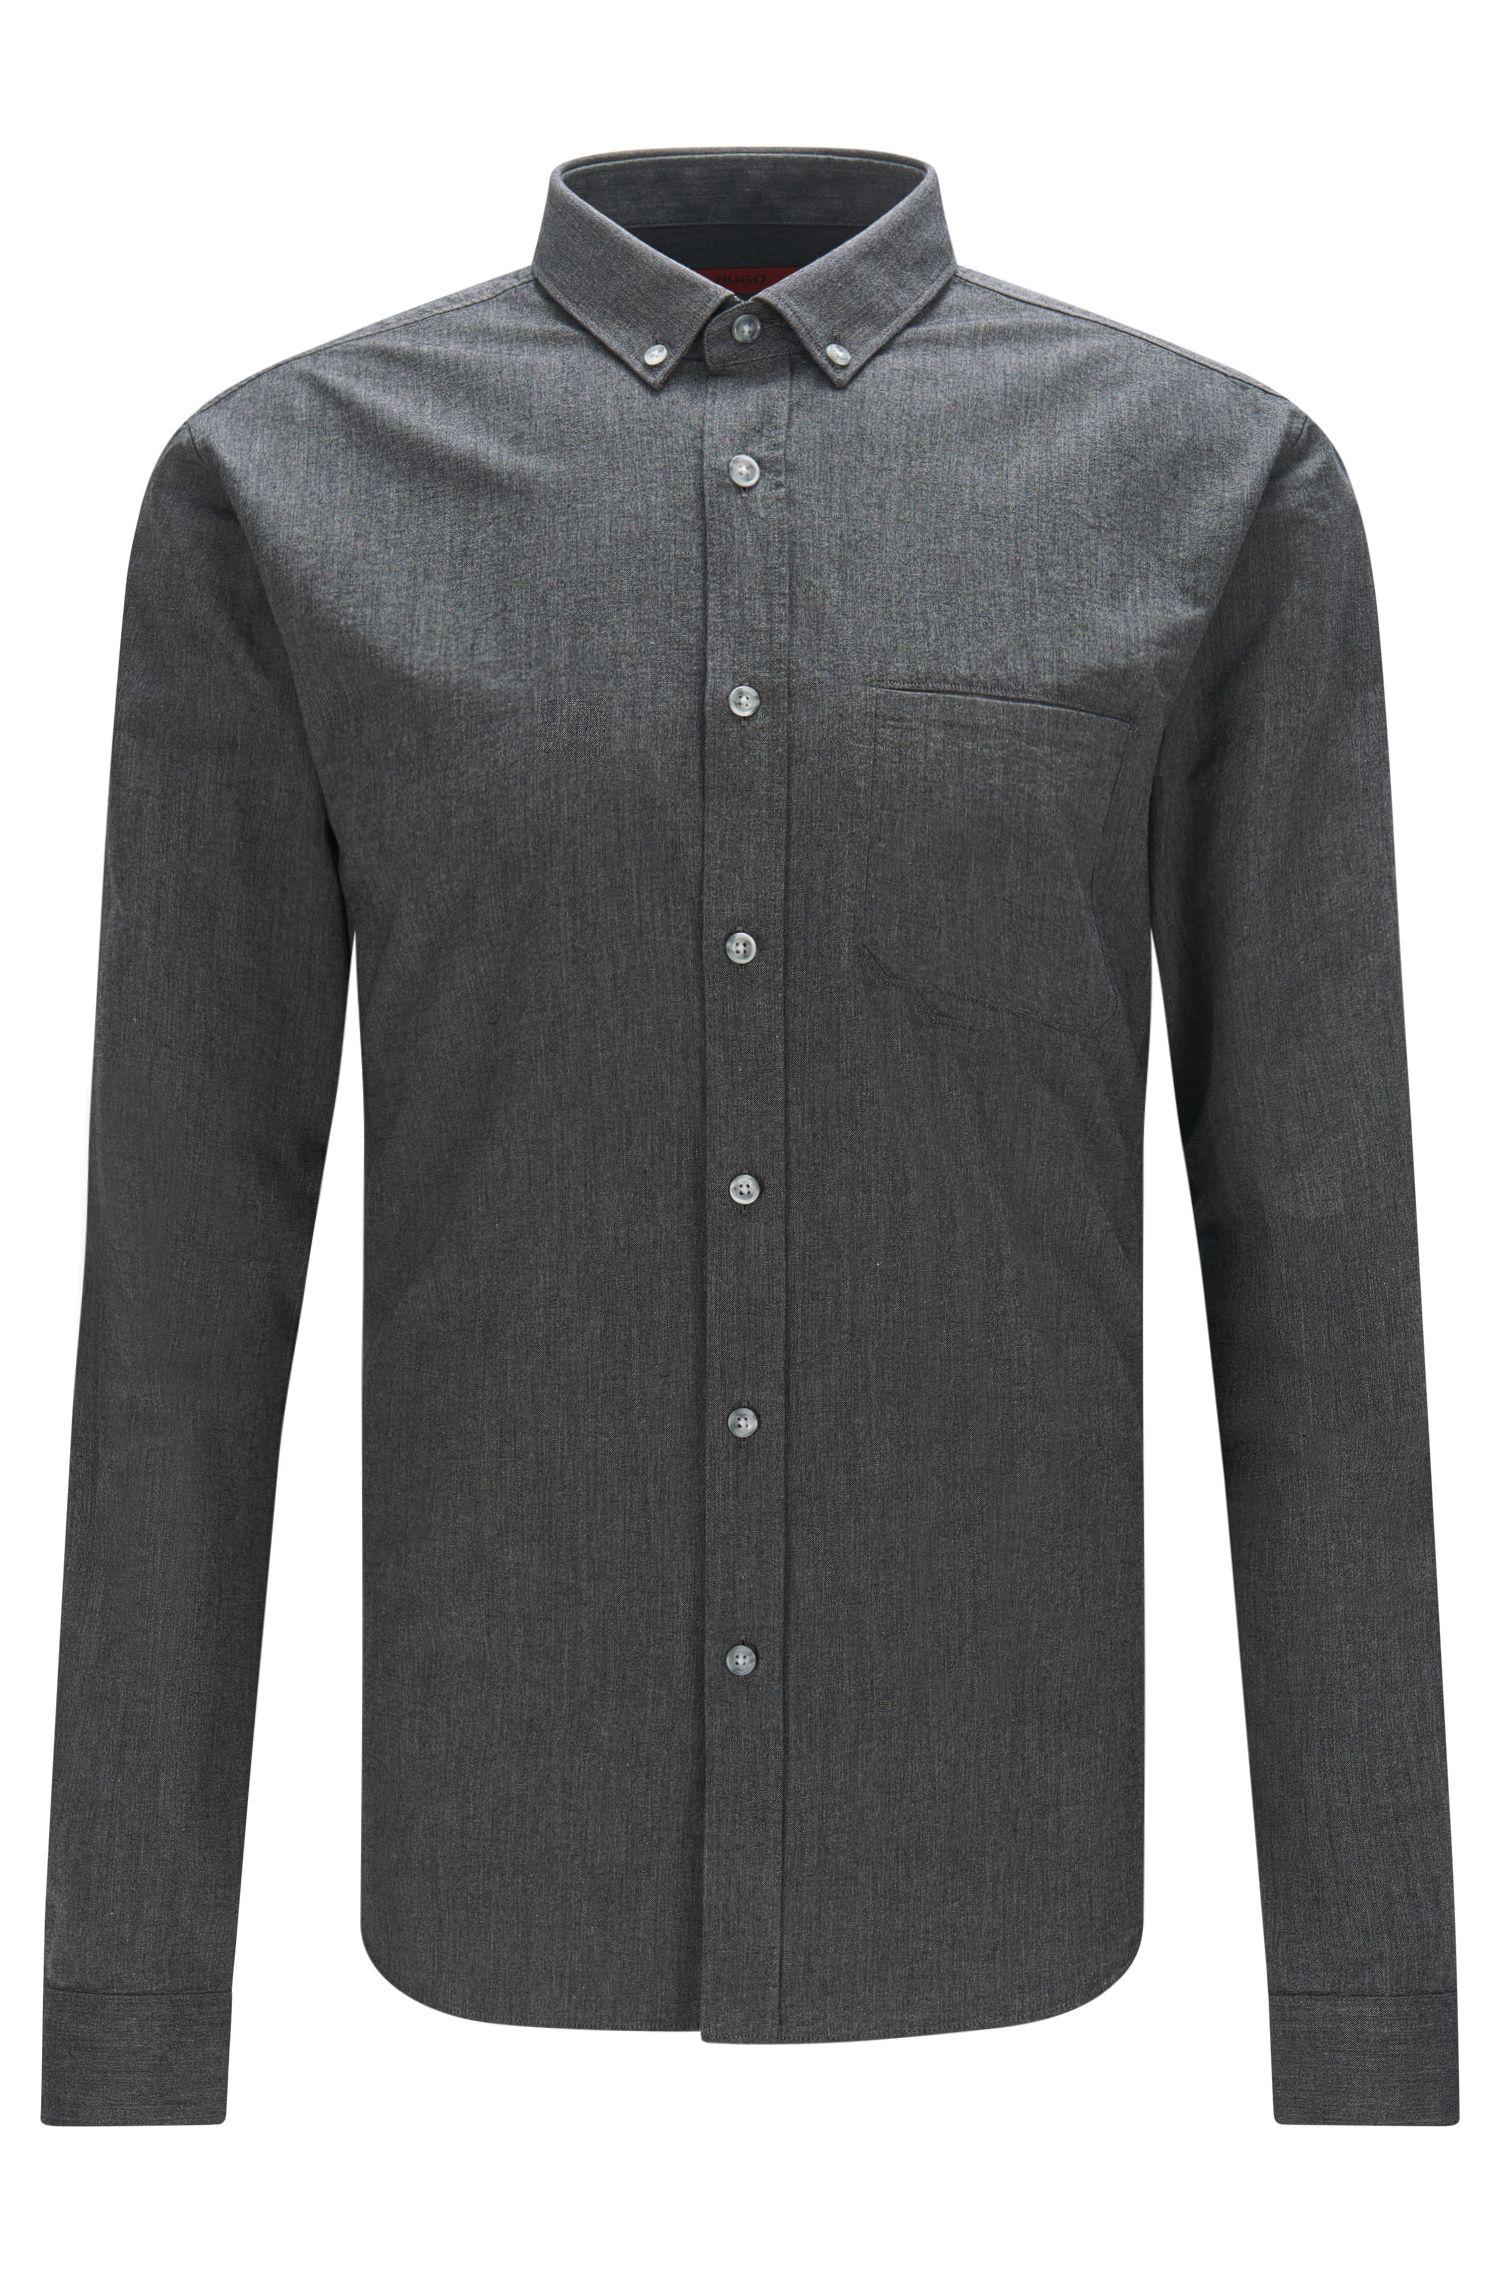 Meliertes Extra Slim-Fit Hemd aus Baumwolle: 'Enico'